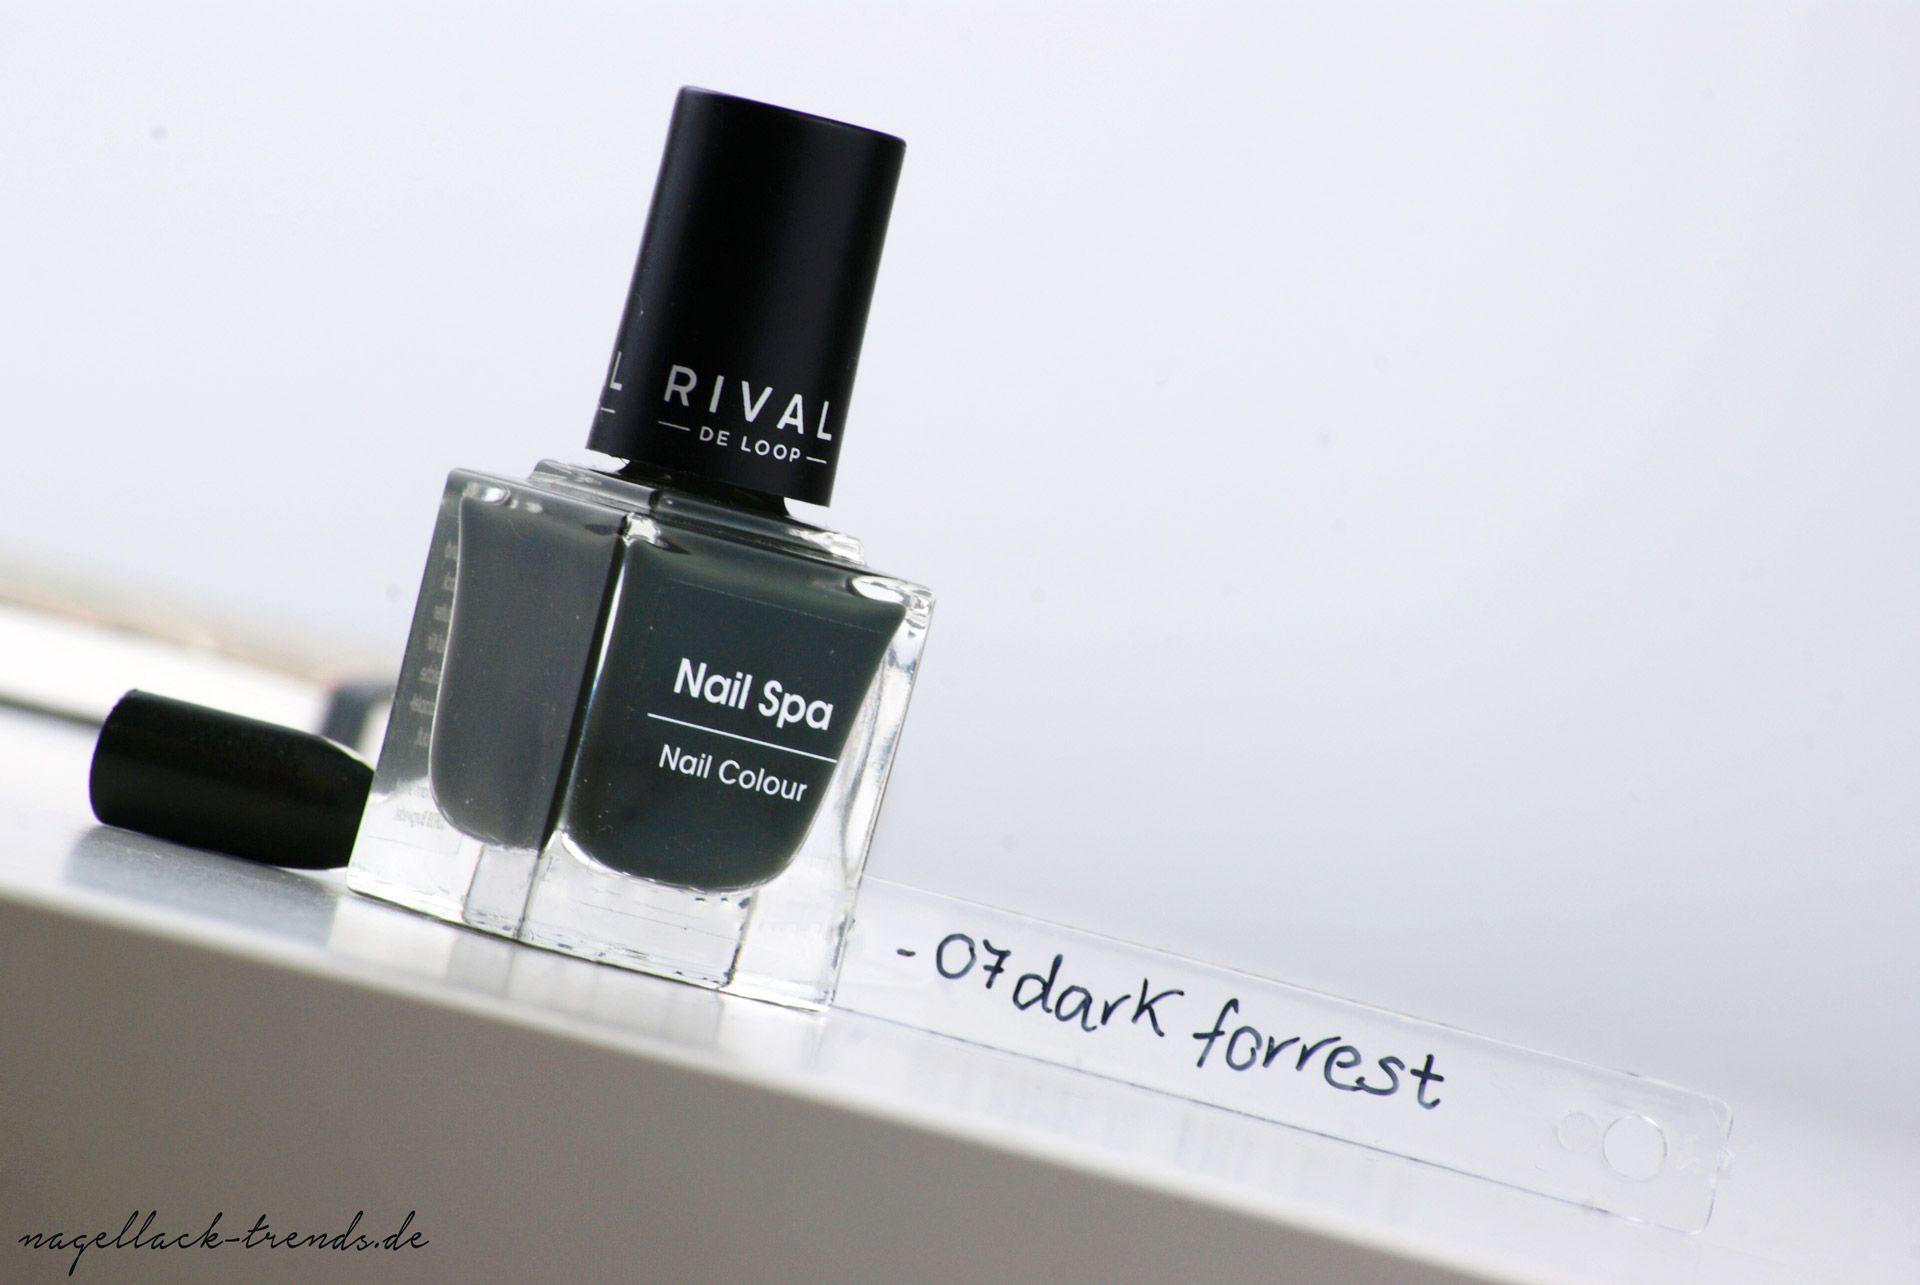 Rival de Loop - Nail Spa Nagellacke - 07 Dark Forrest | Nail spa ...